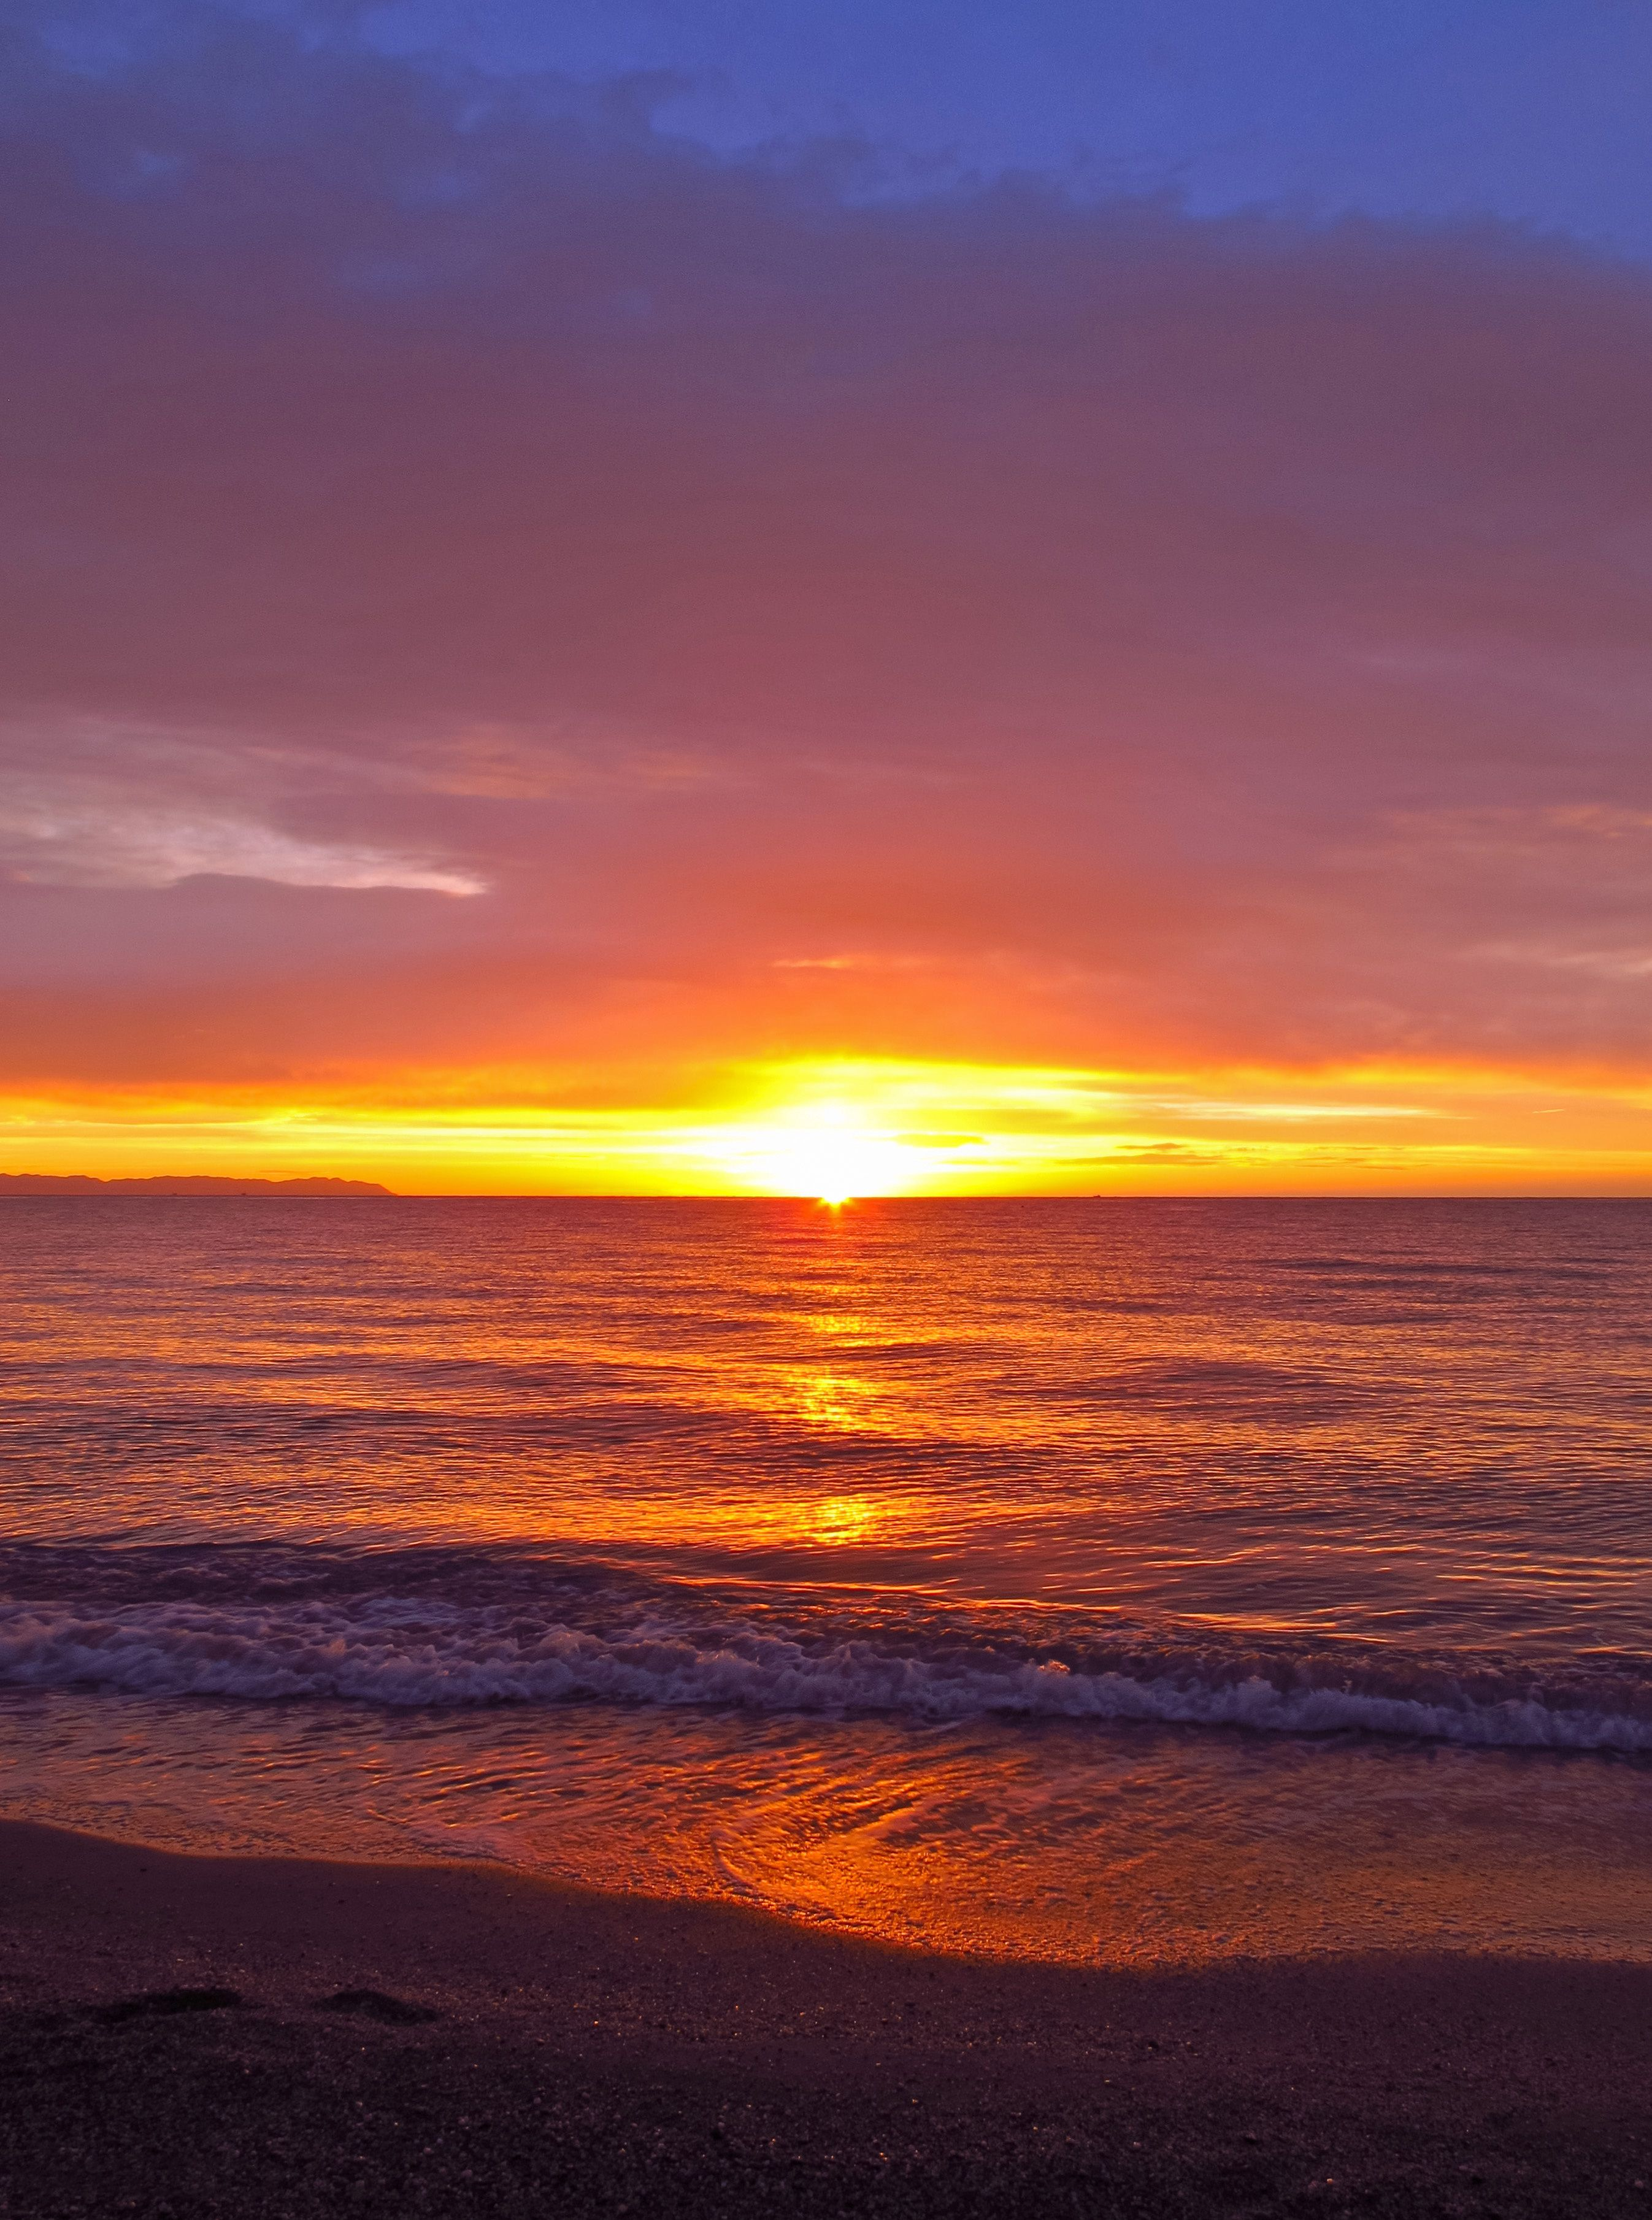 Wake up to a spectacular sunrise in Cabo De Gata. #Travel  #Almeria